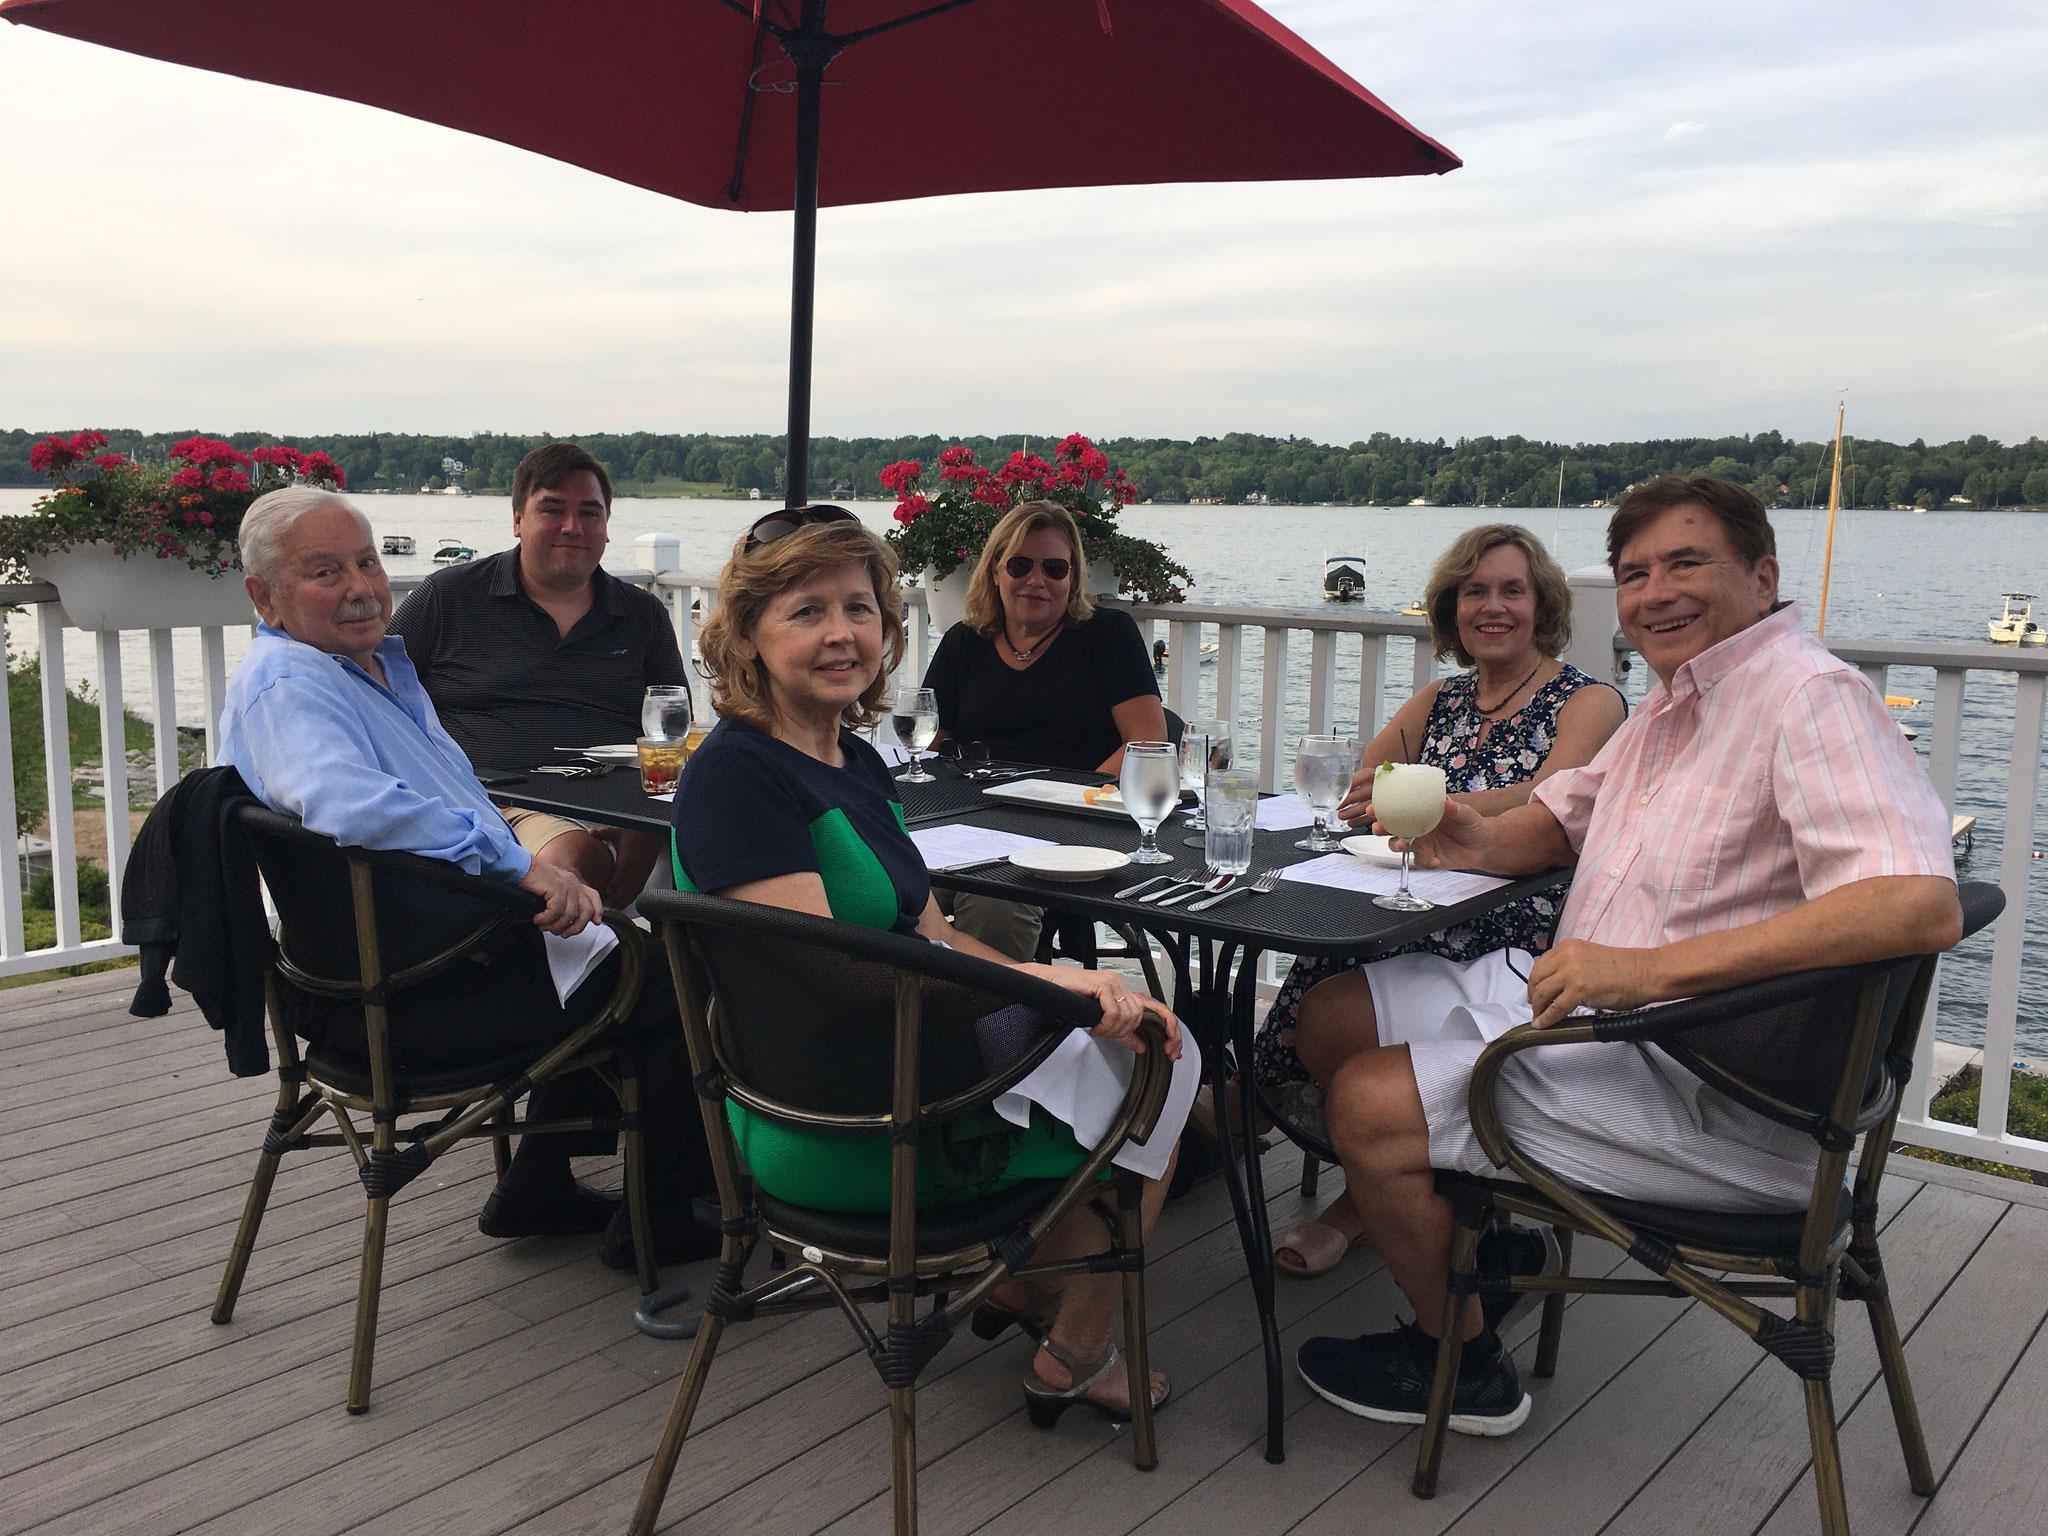 Don Fischman, Greg, Barbara, Celeste, Lorraine & John at the Skaneateles Country Club, 7-2020